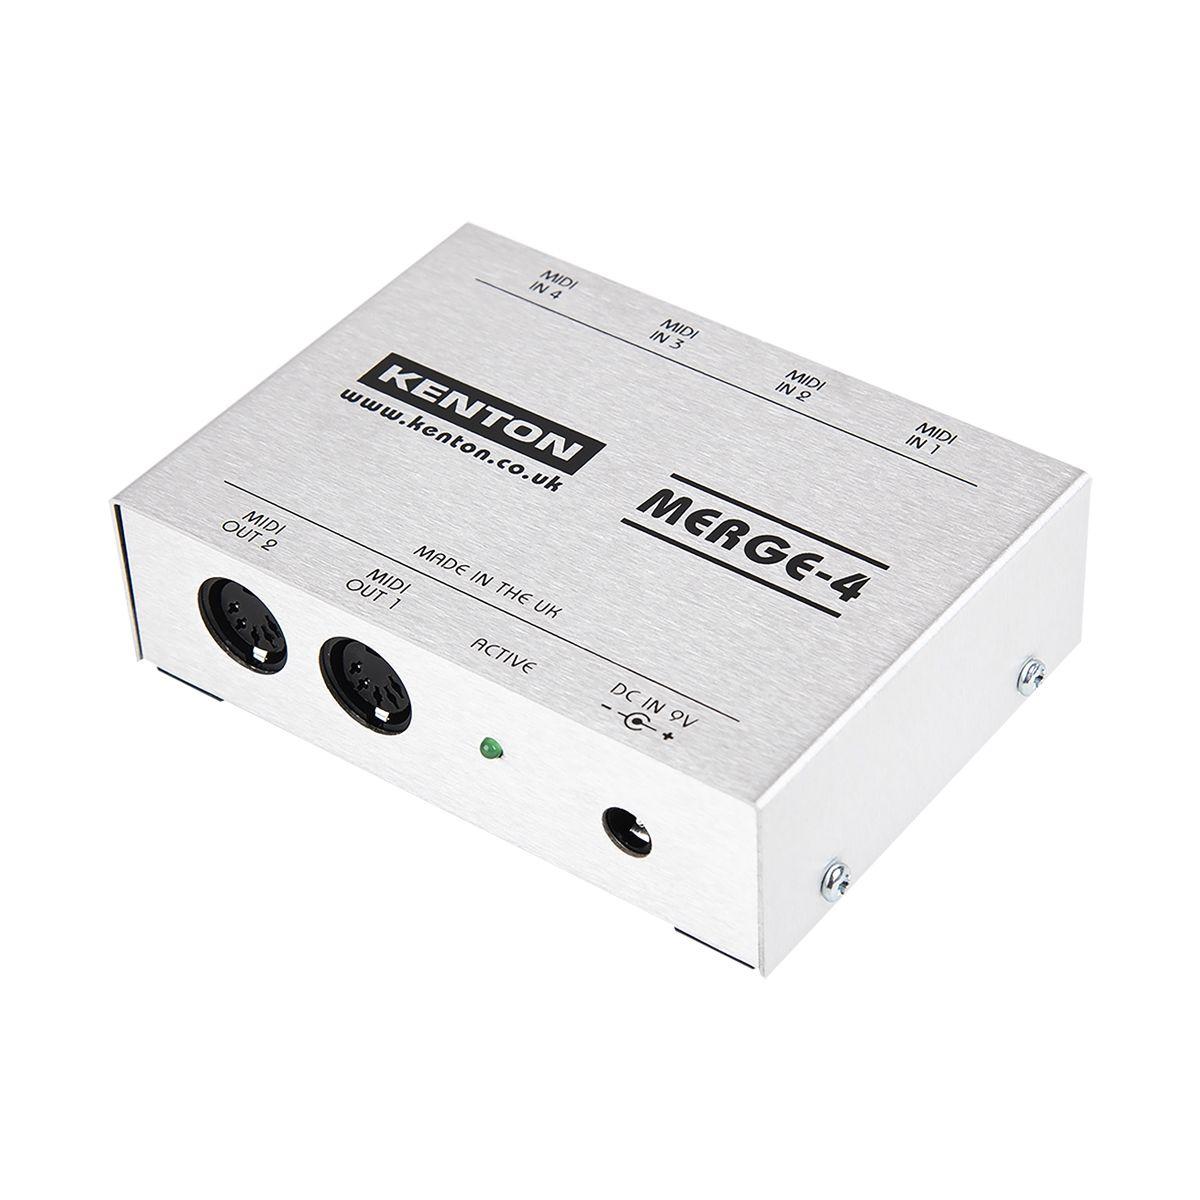 Kenton ElectronicsMERGE 4 MIDI Merge Box